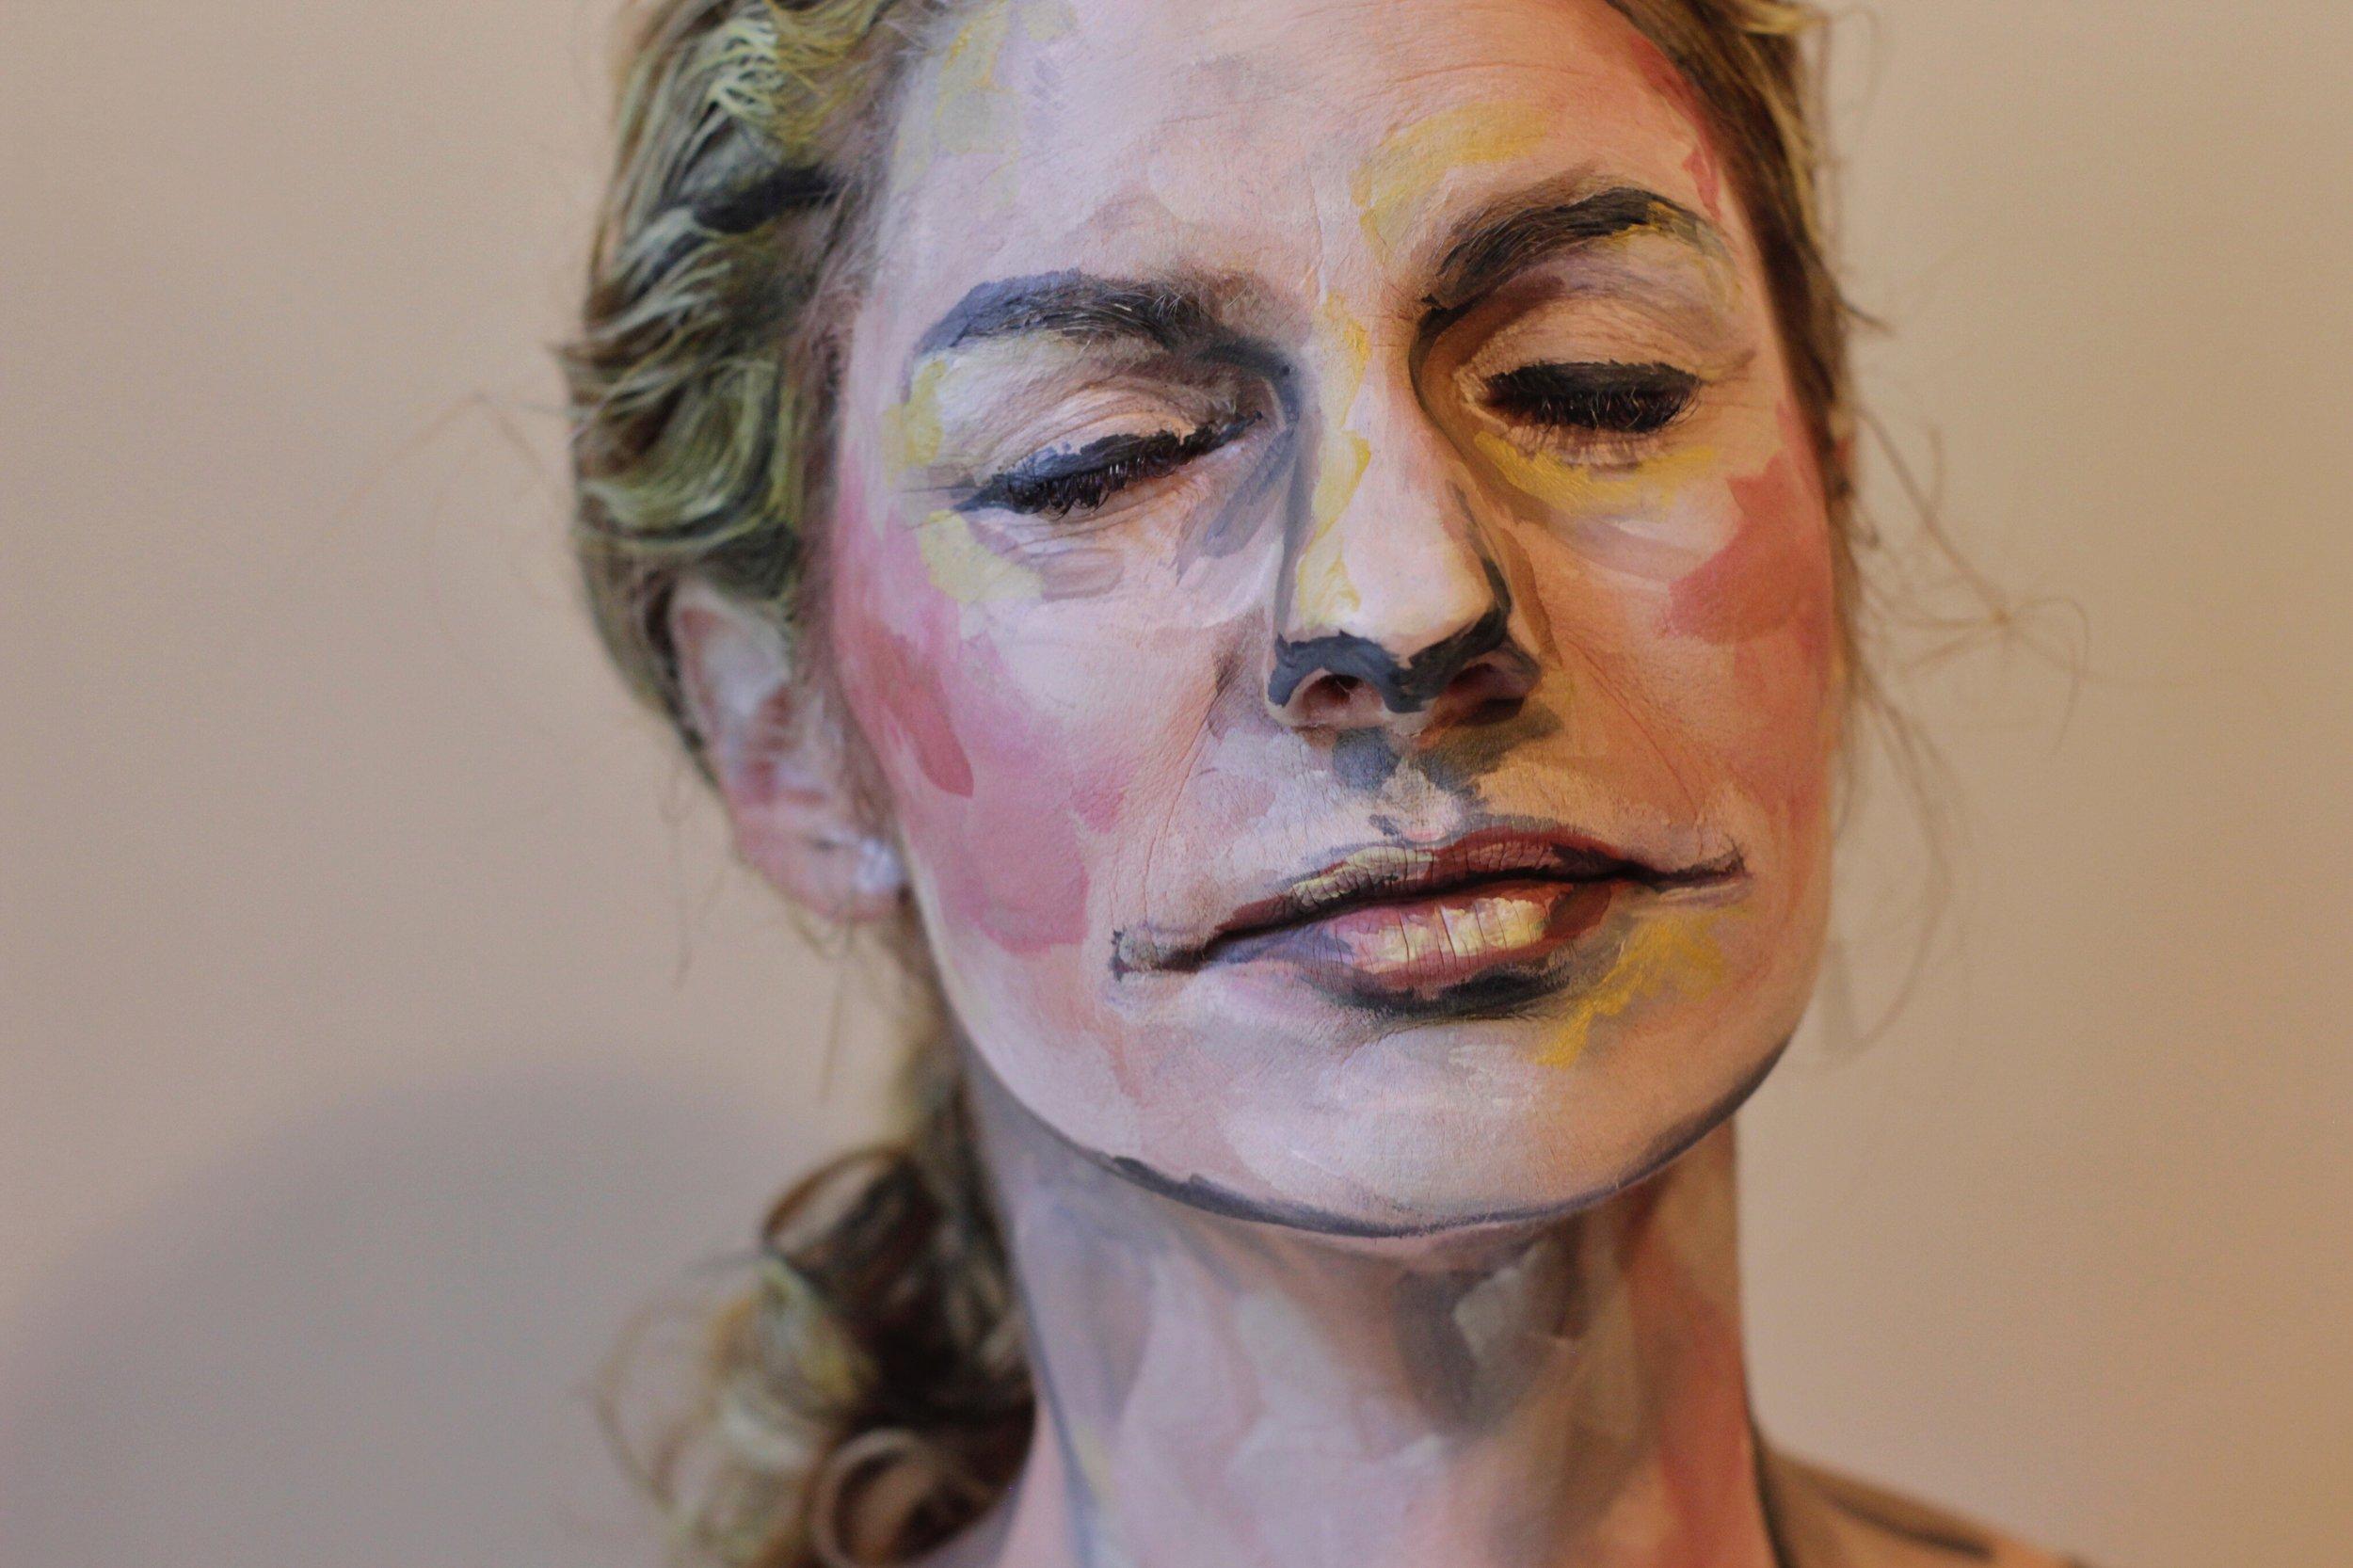 Dale Portrait 1.JPG